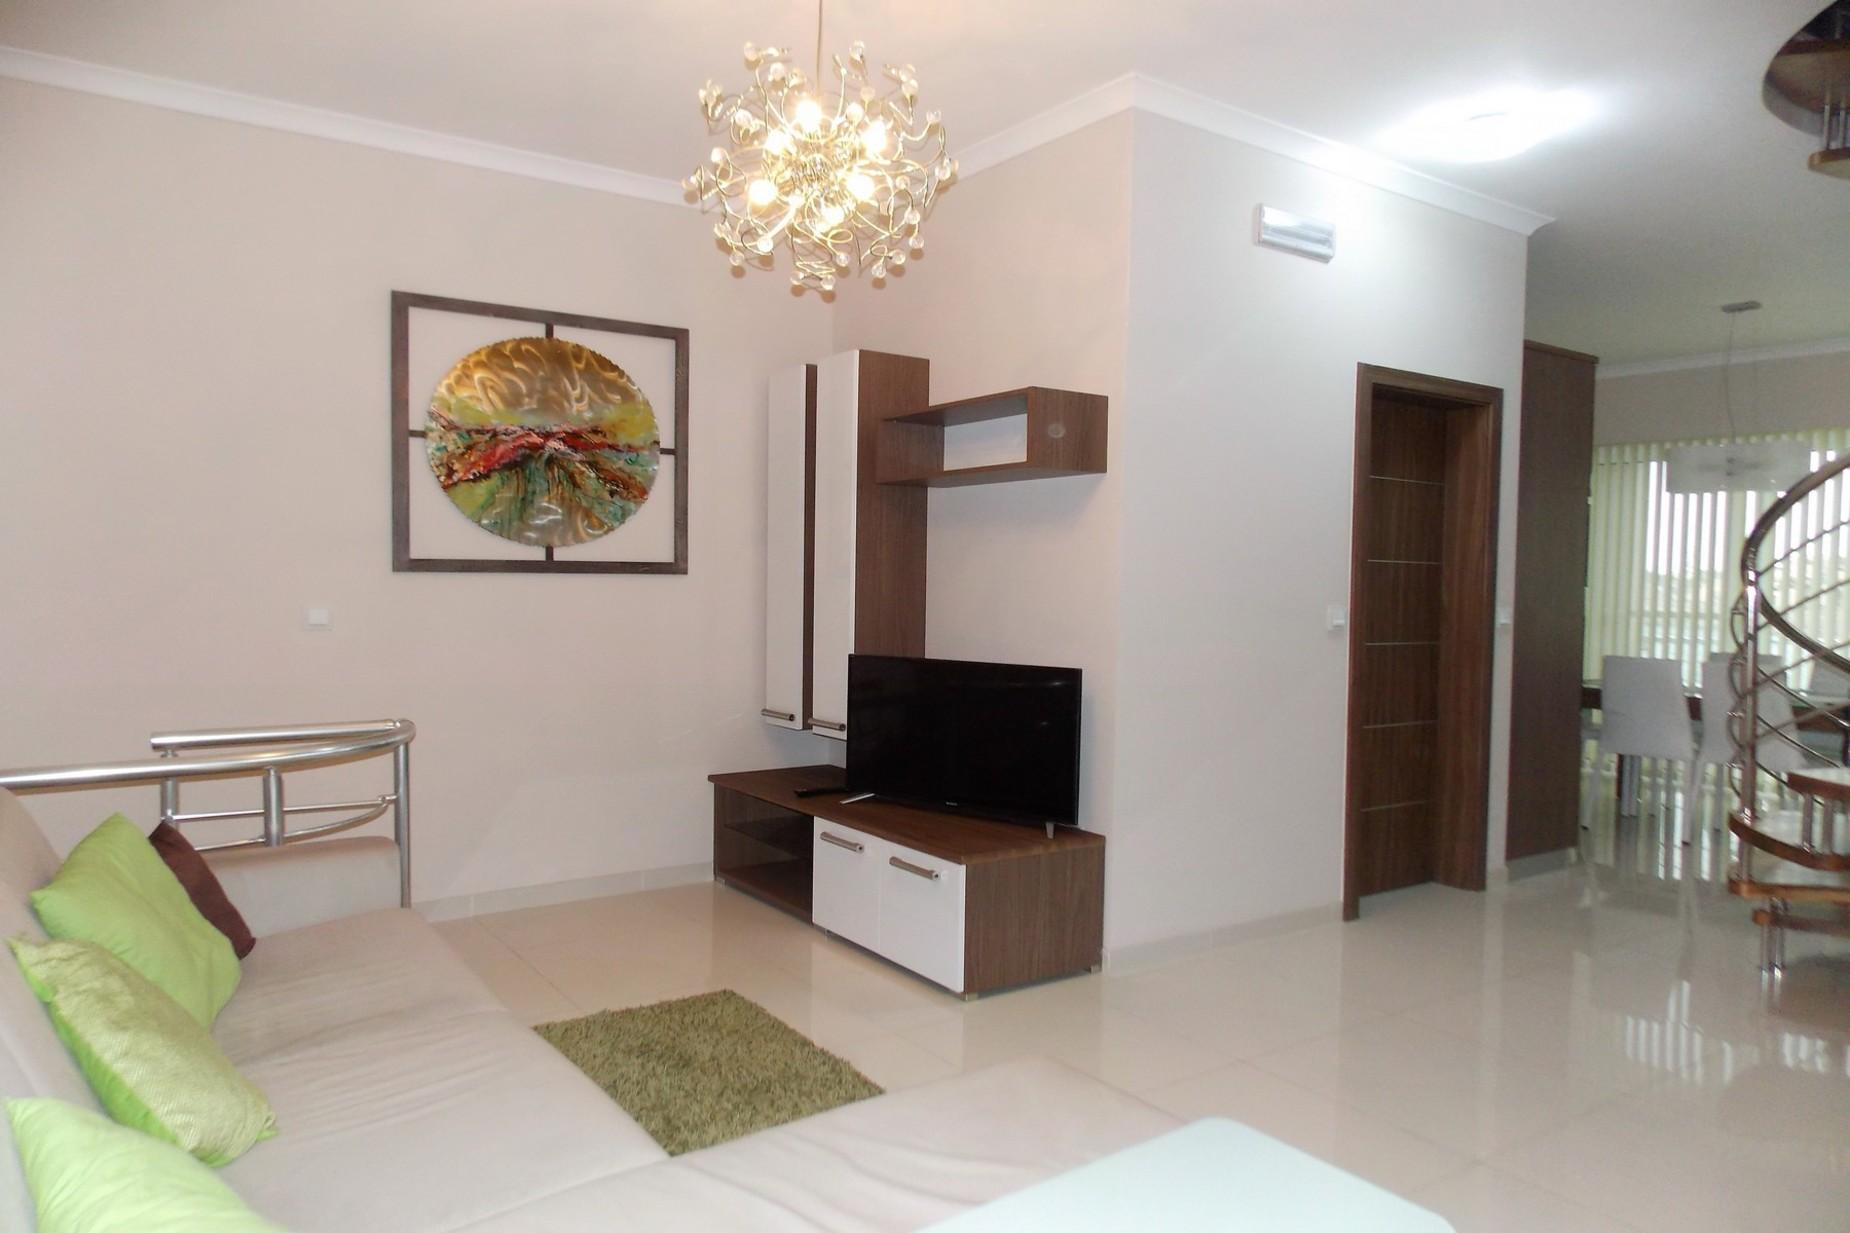 2 bed Terraced House For Rent in Marsascala, Marsascala - thumb 6